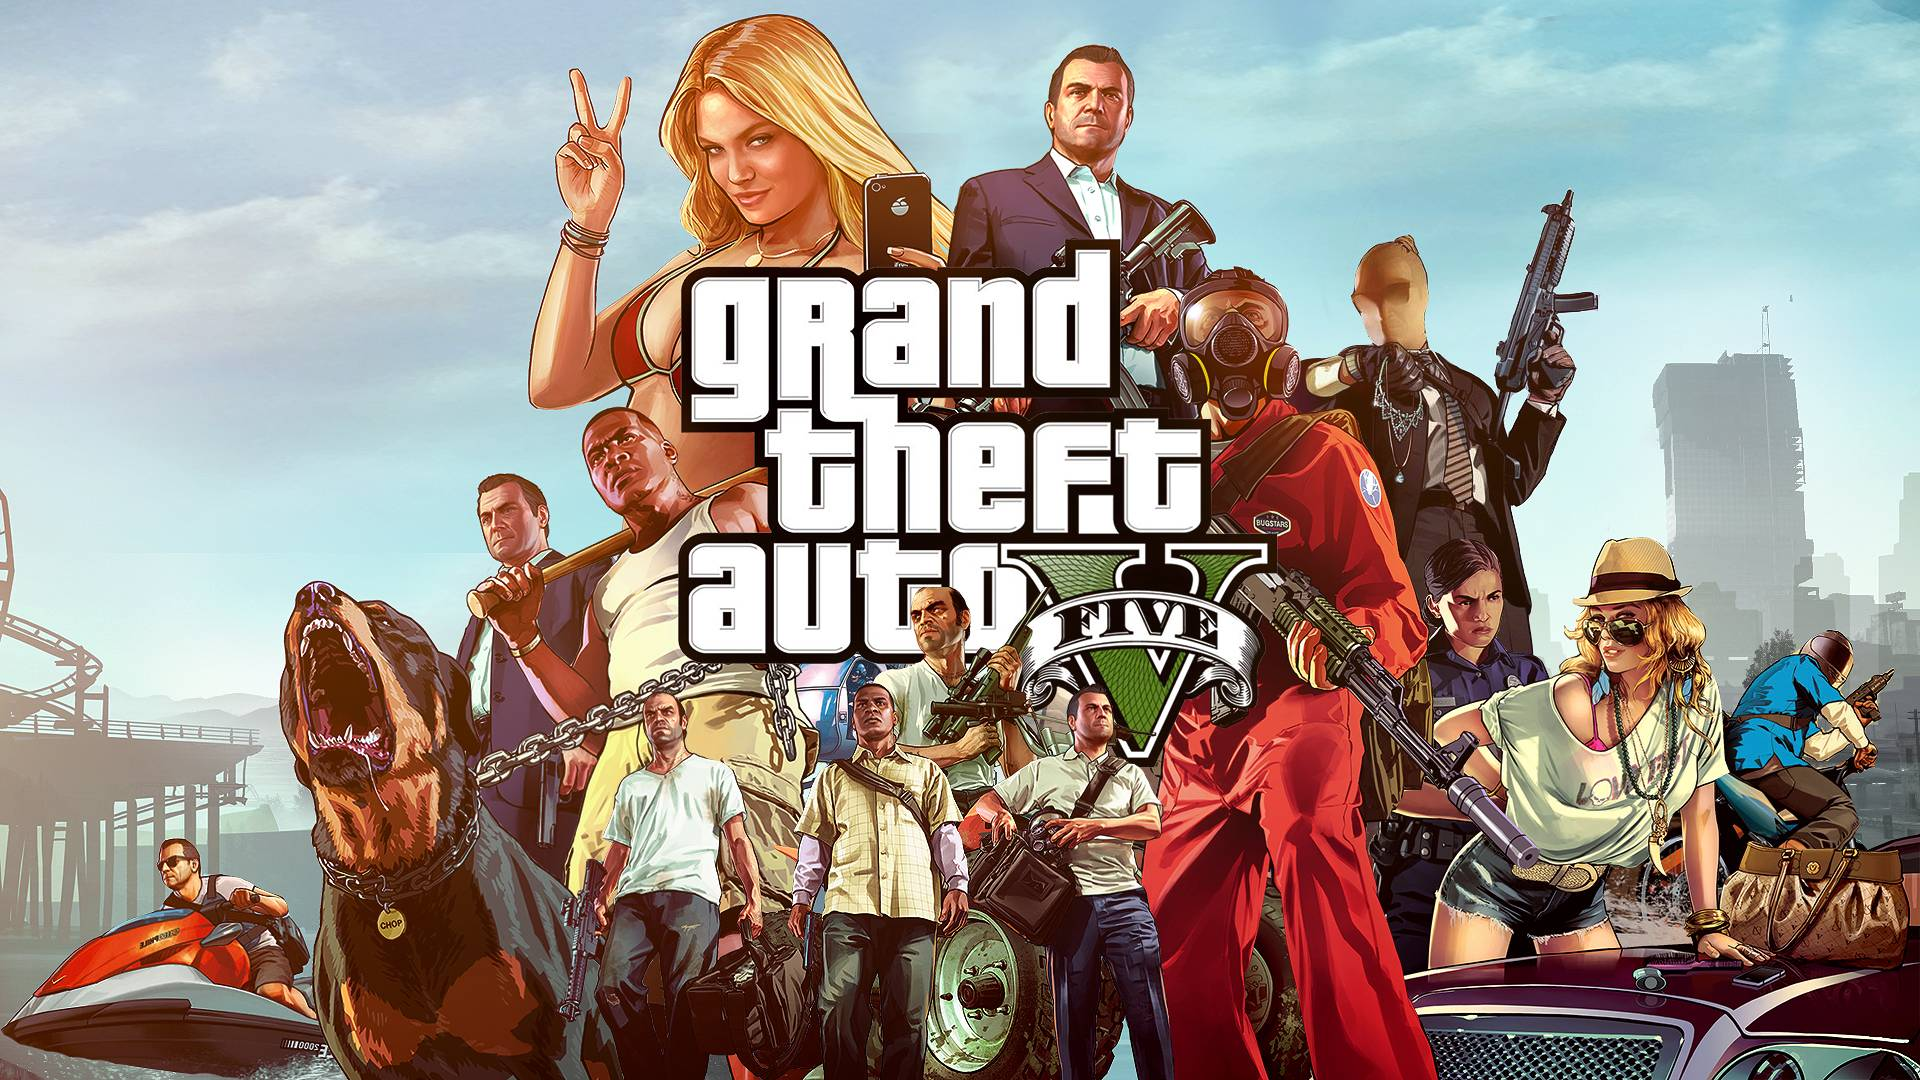 Grand Theft Auto 5 Gta V Wallpaper 40134 in Games - Telusers.com